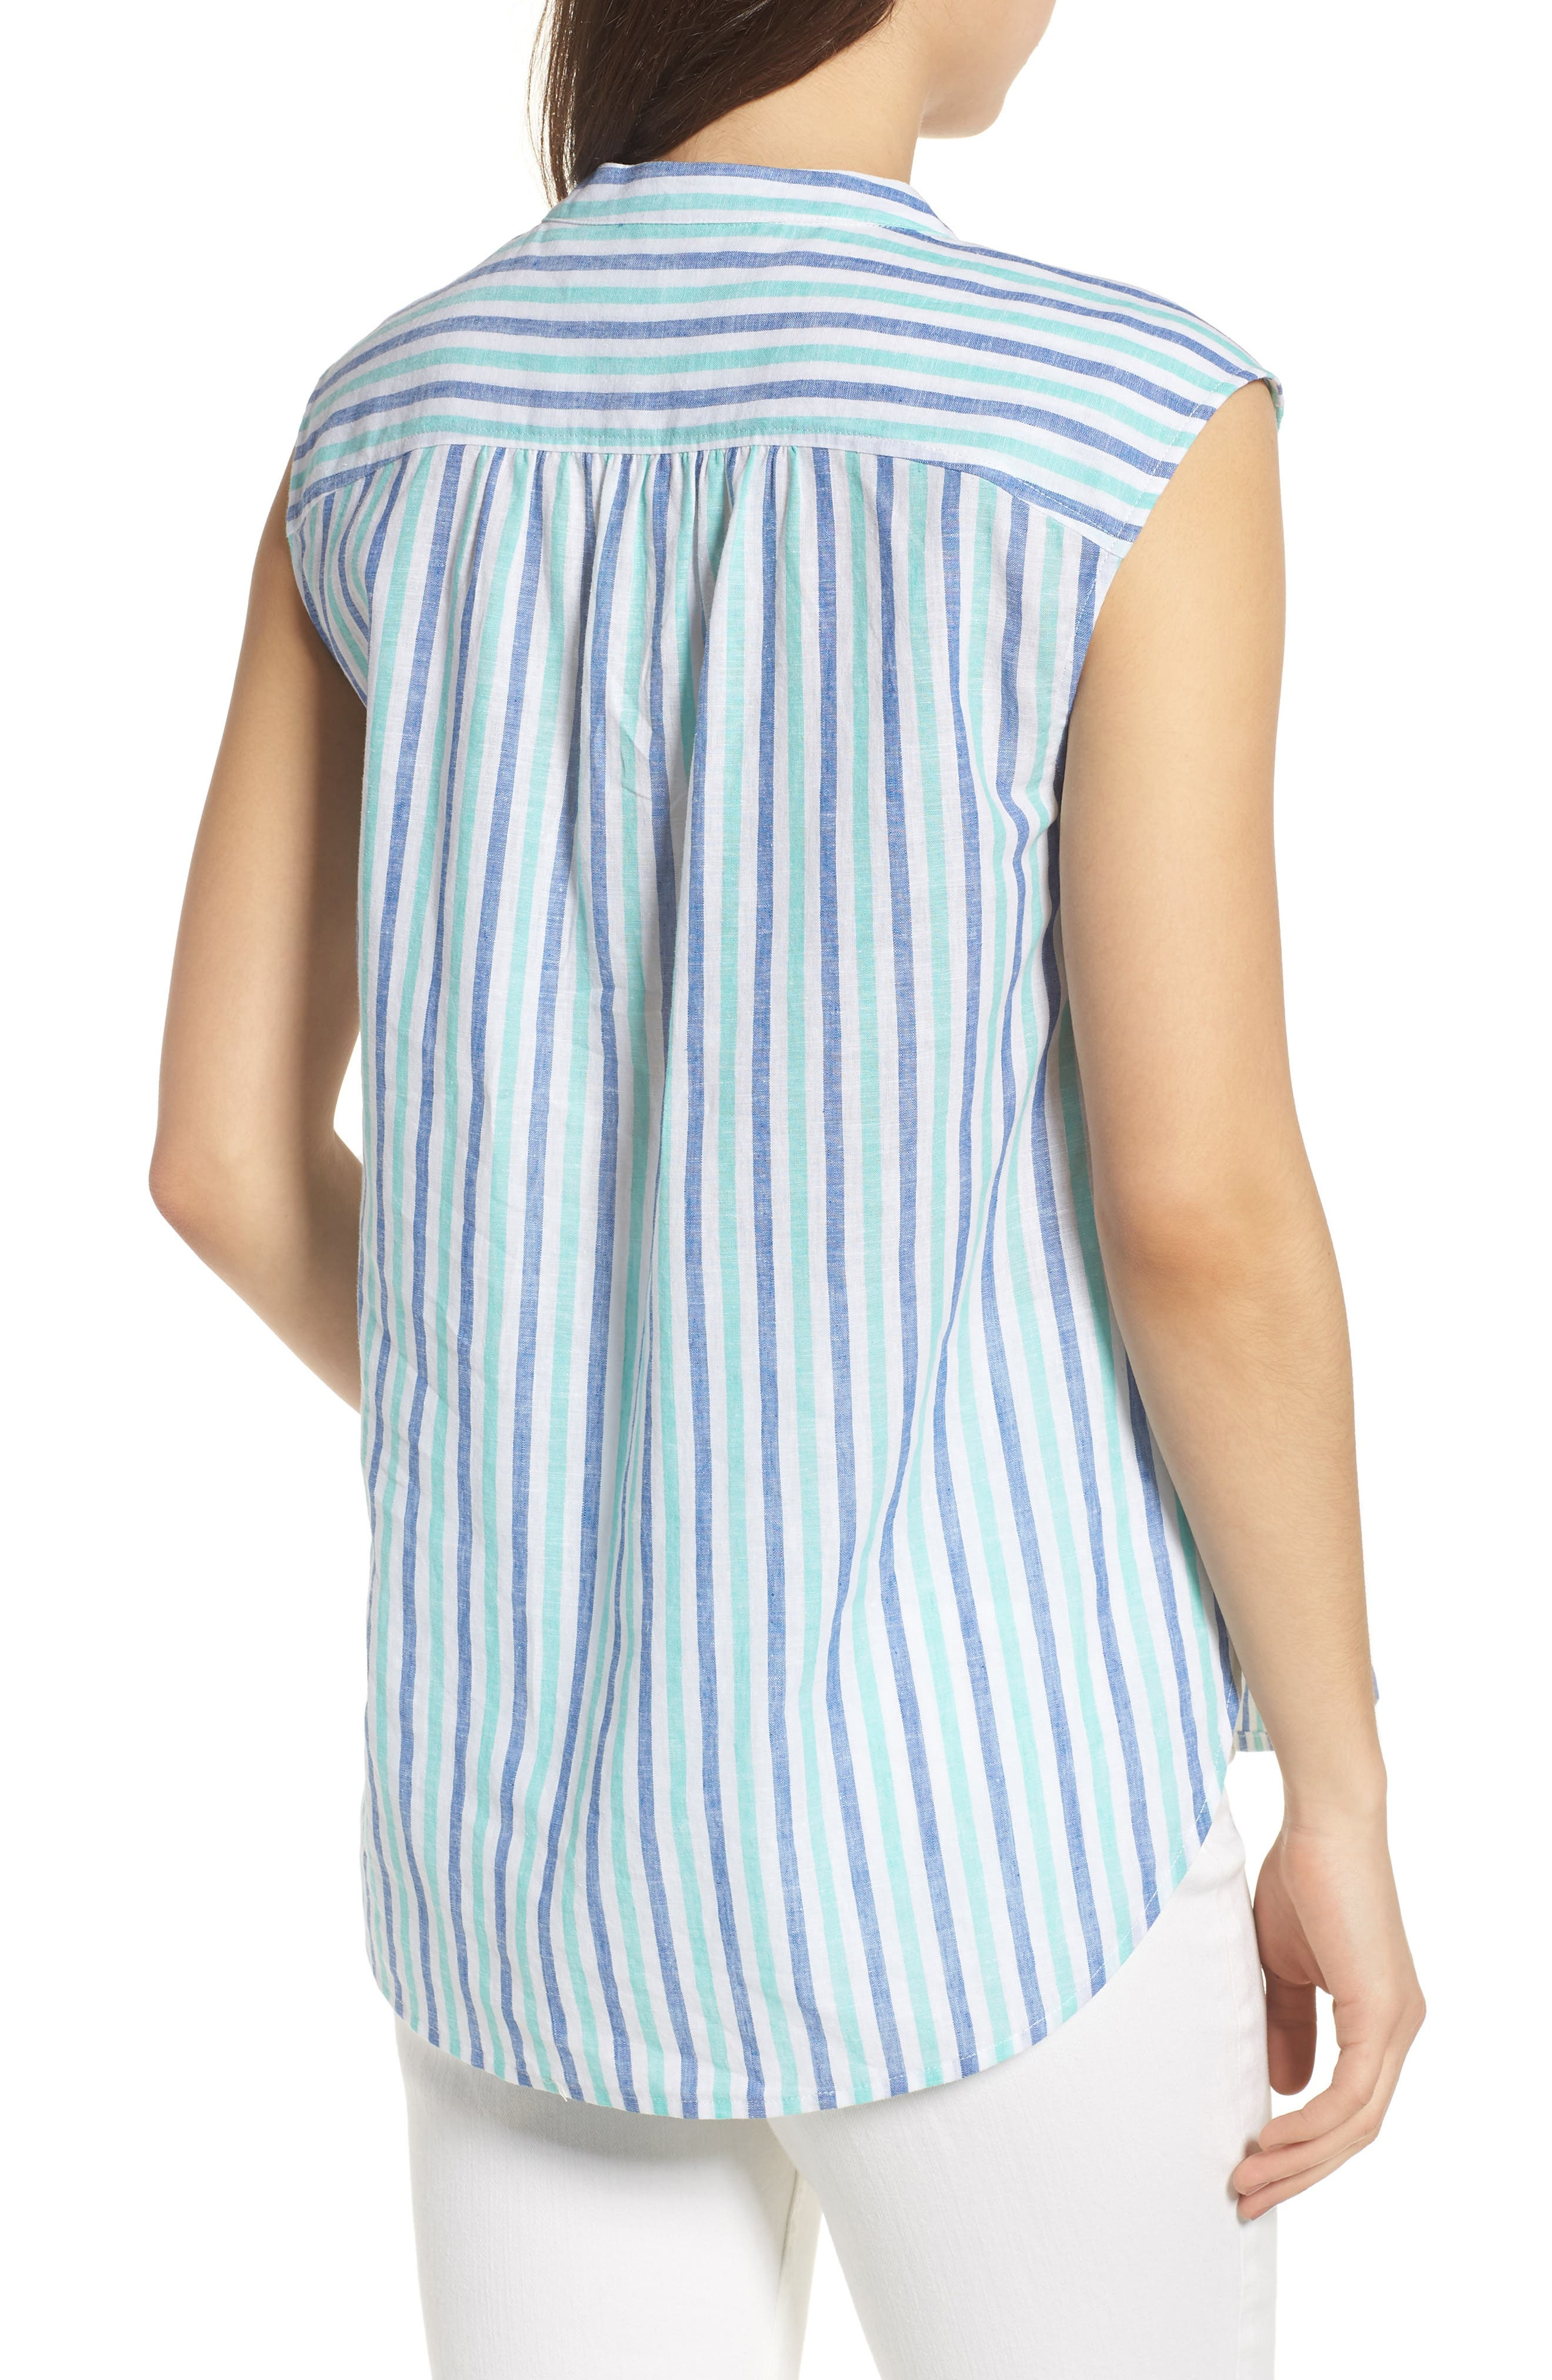 Hope Bay Linen Cotton Stripe Top,                             Alternate thumbnail 2, color,                             Capri Blue